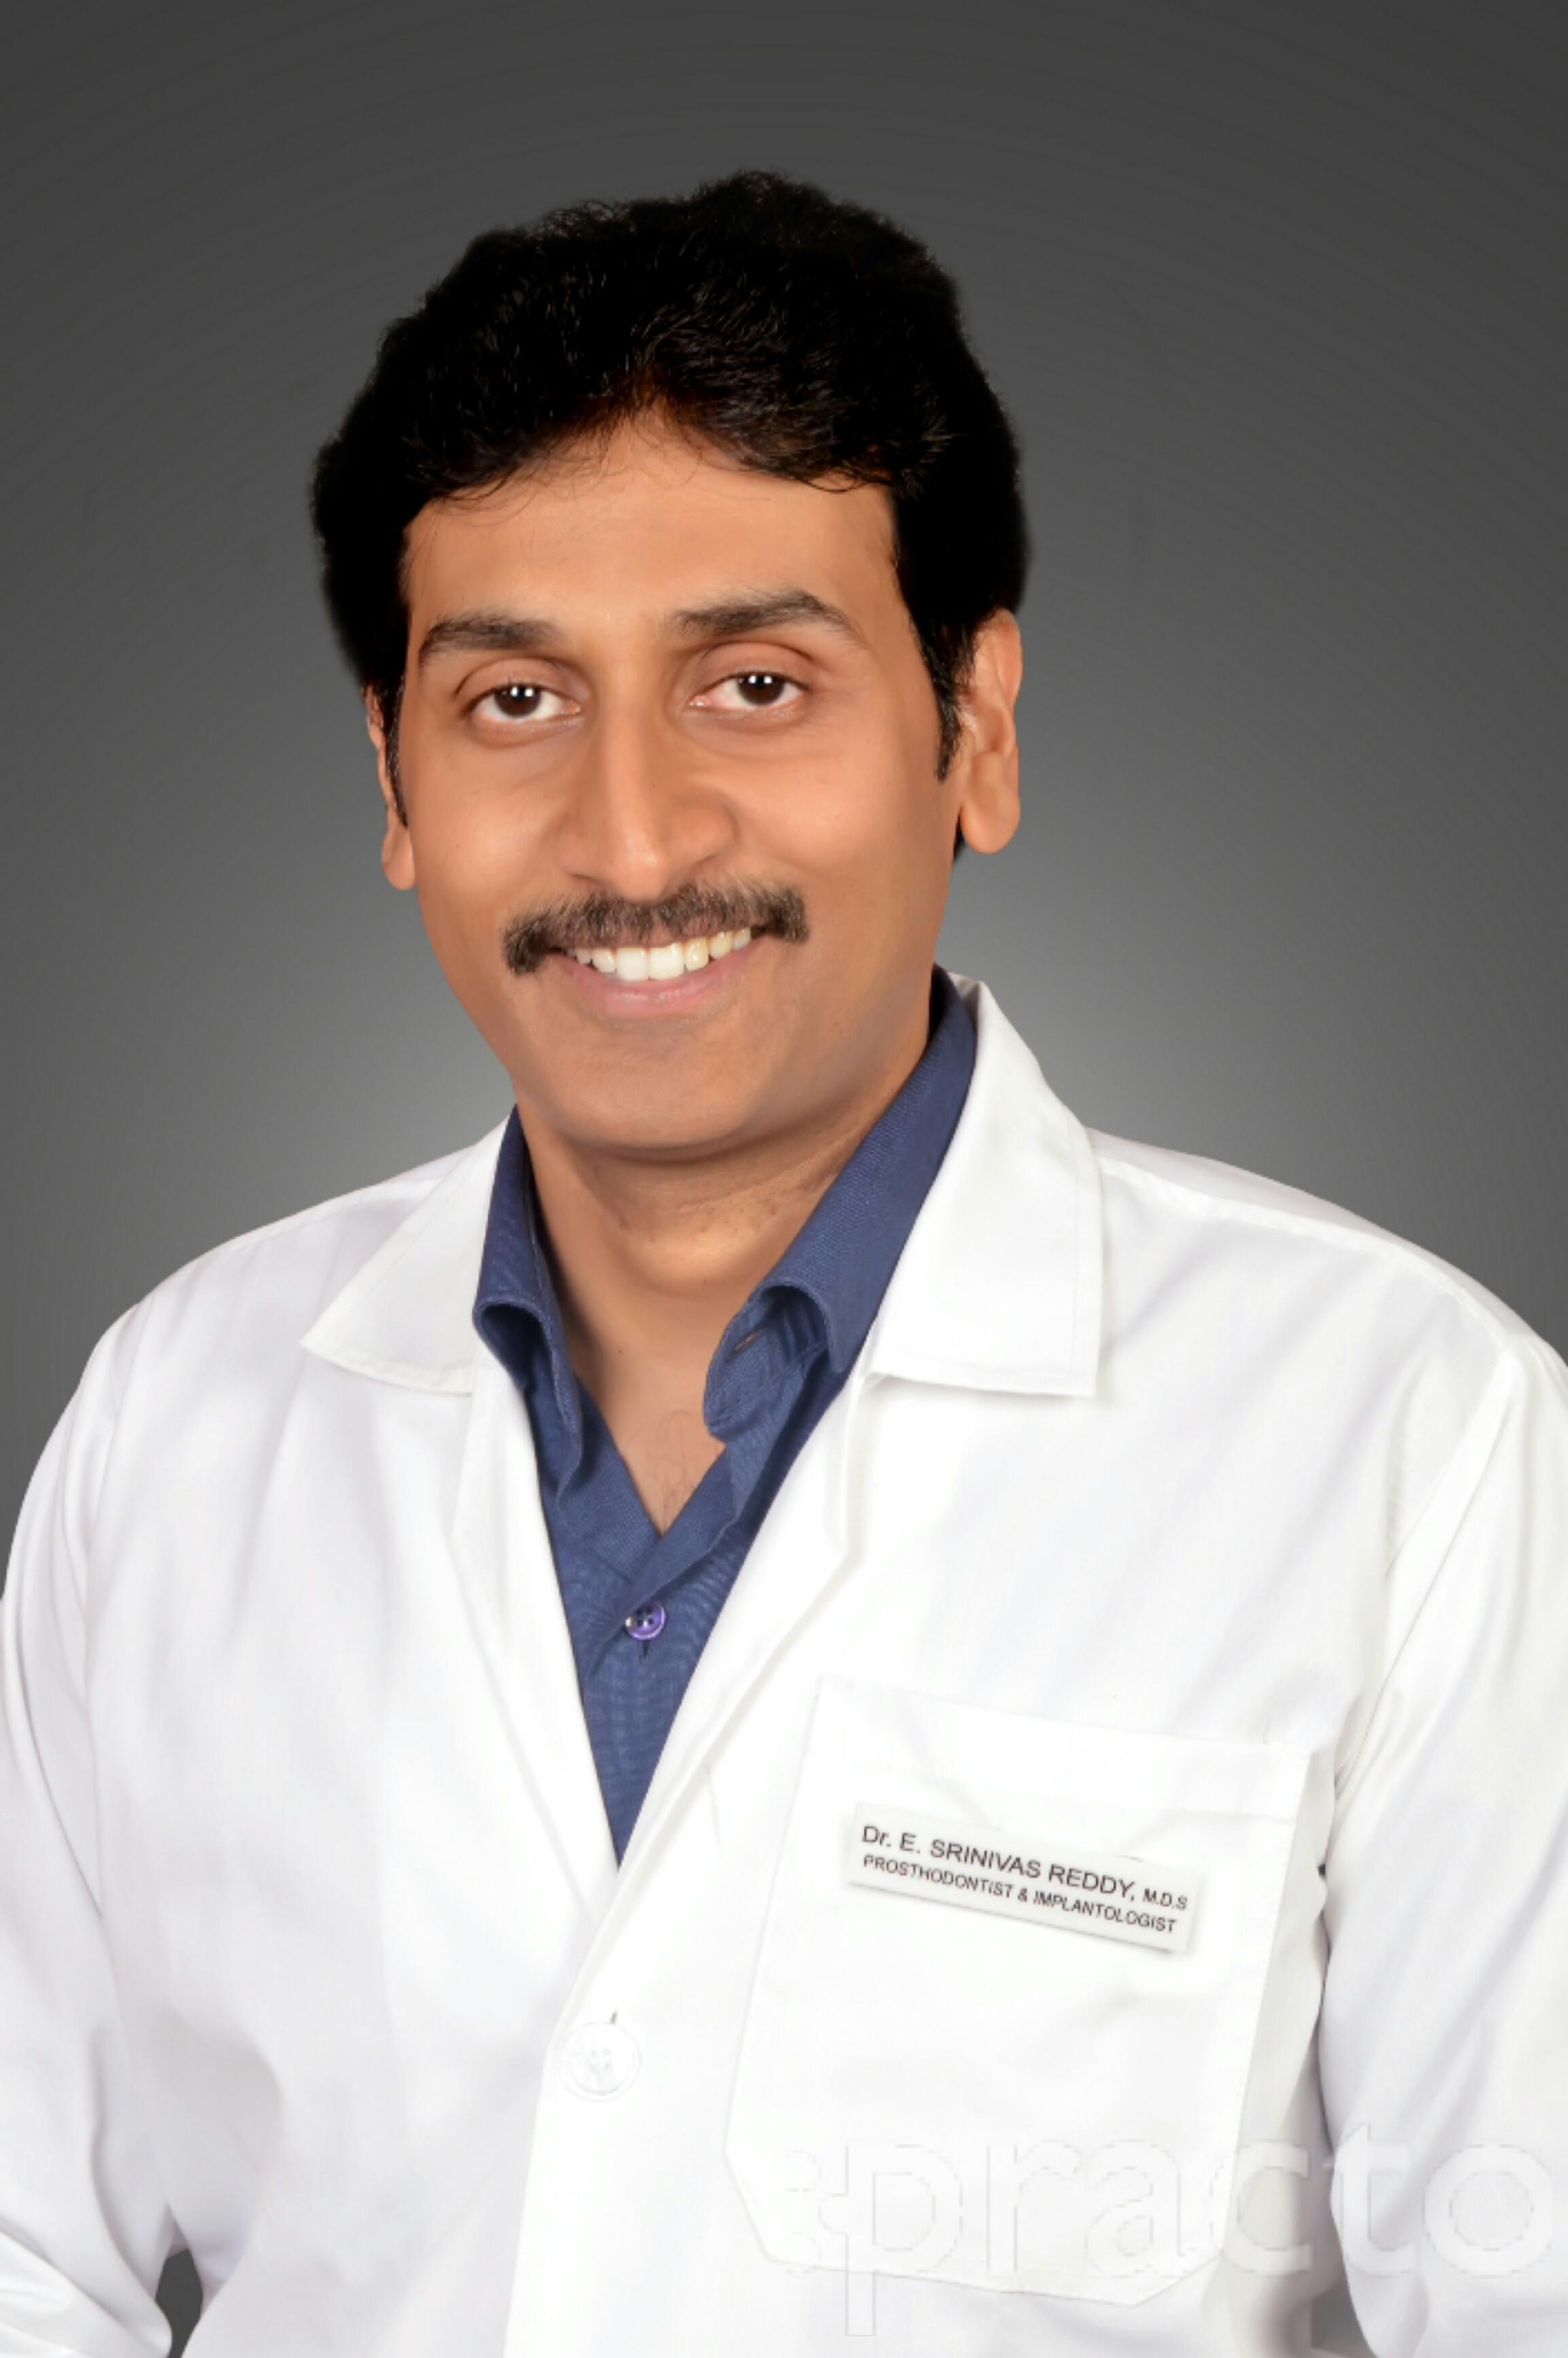 Dr. Srinivas Reddy E - Dentist